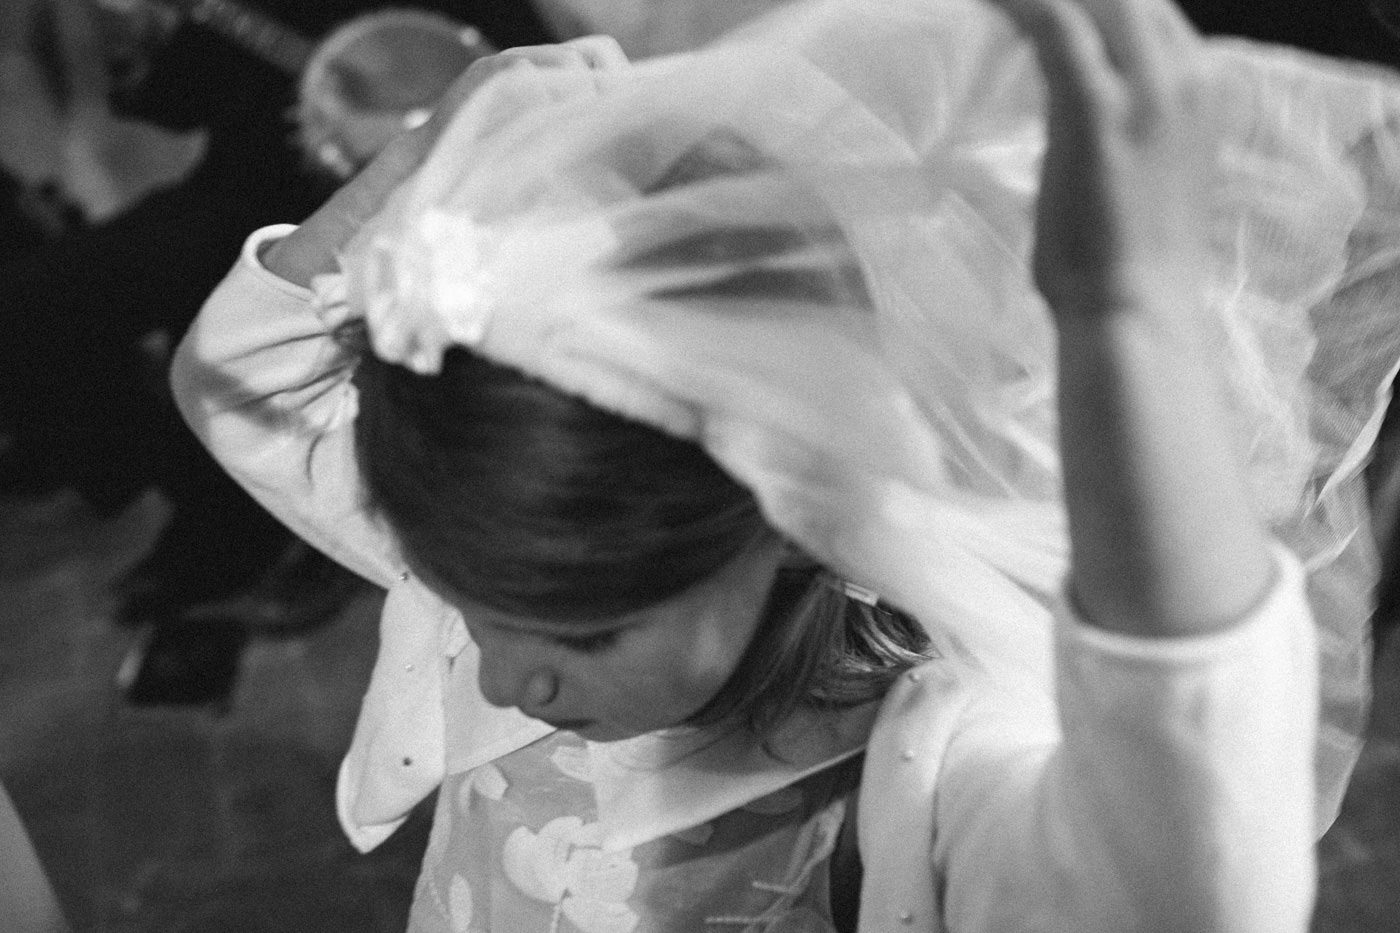 matrimoni_all_italiana_fotografo_matrimonio_toscana-75.jpg